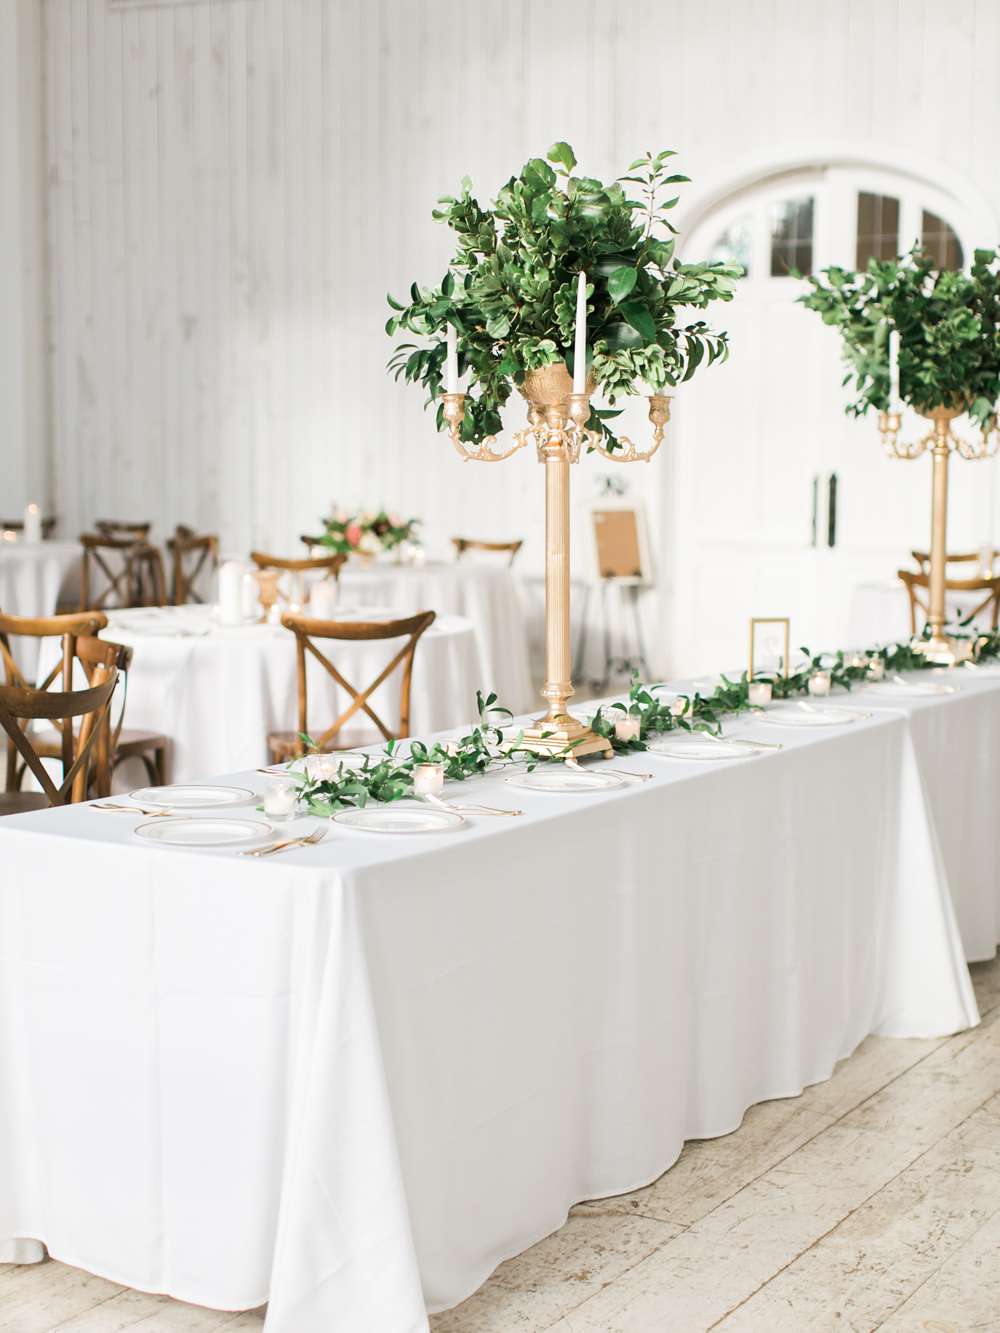 romantic receptions - photo by Elisabeth Carol Photography http://ruffledblog.com/picturesque-garden-wedding-at-white-sparrow-barn